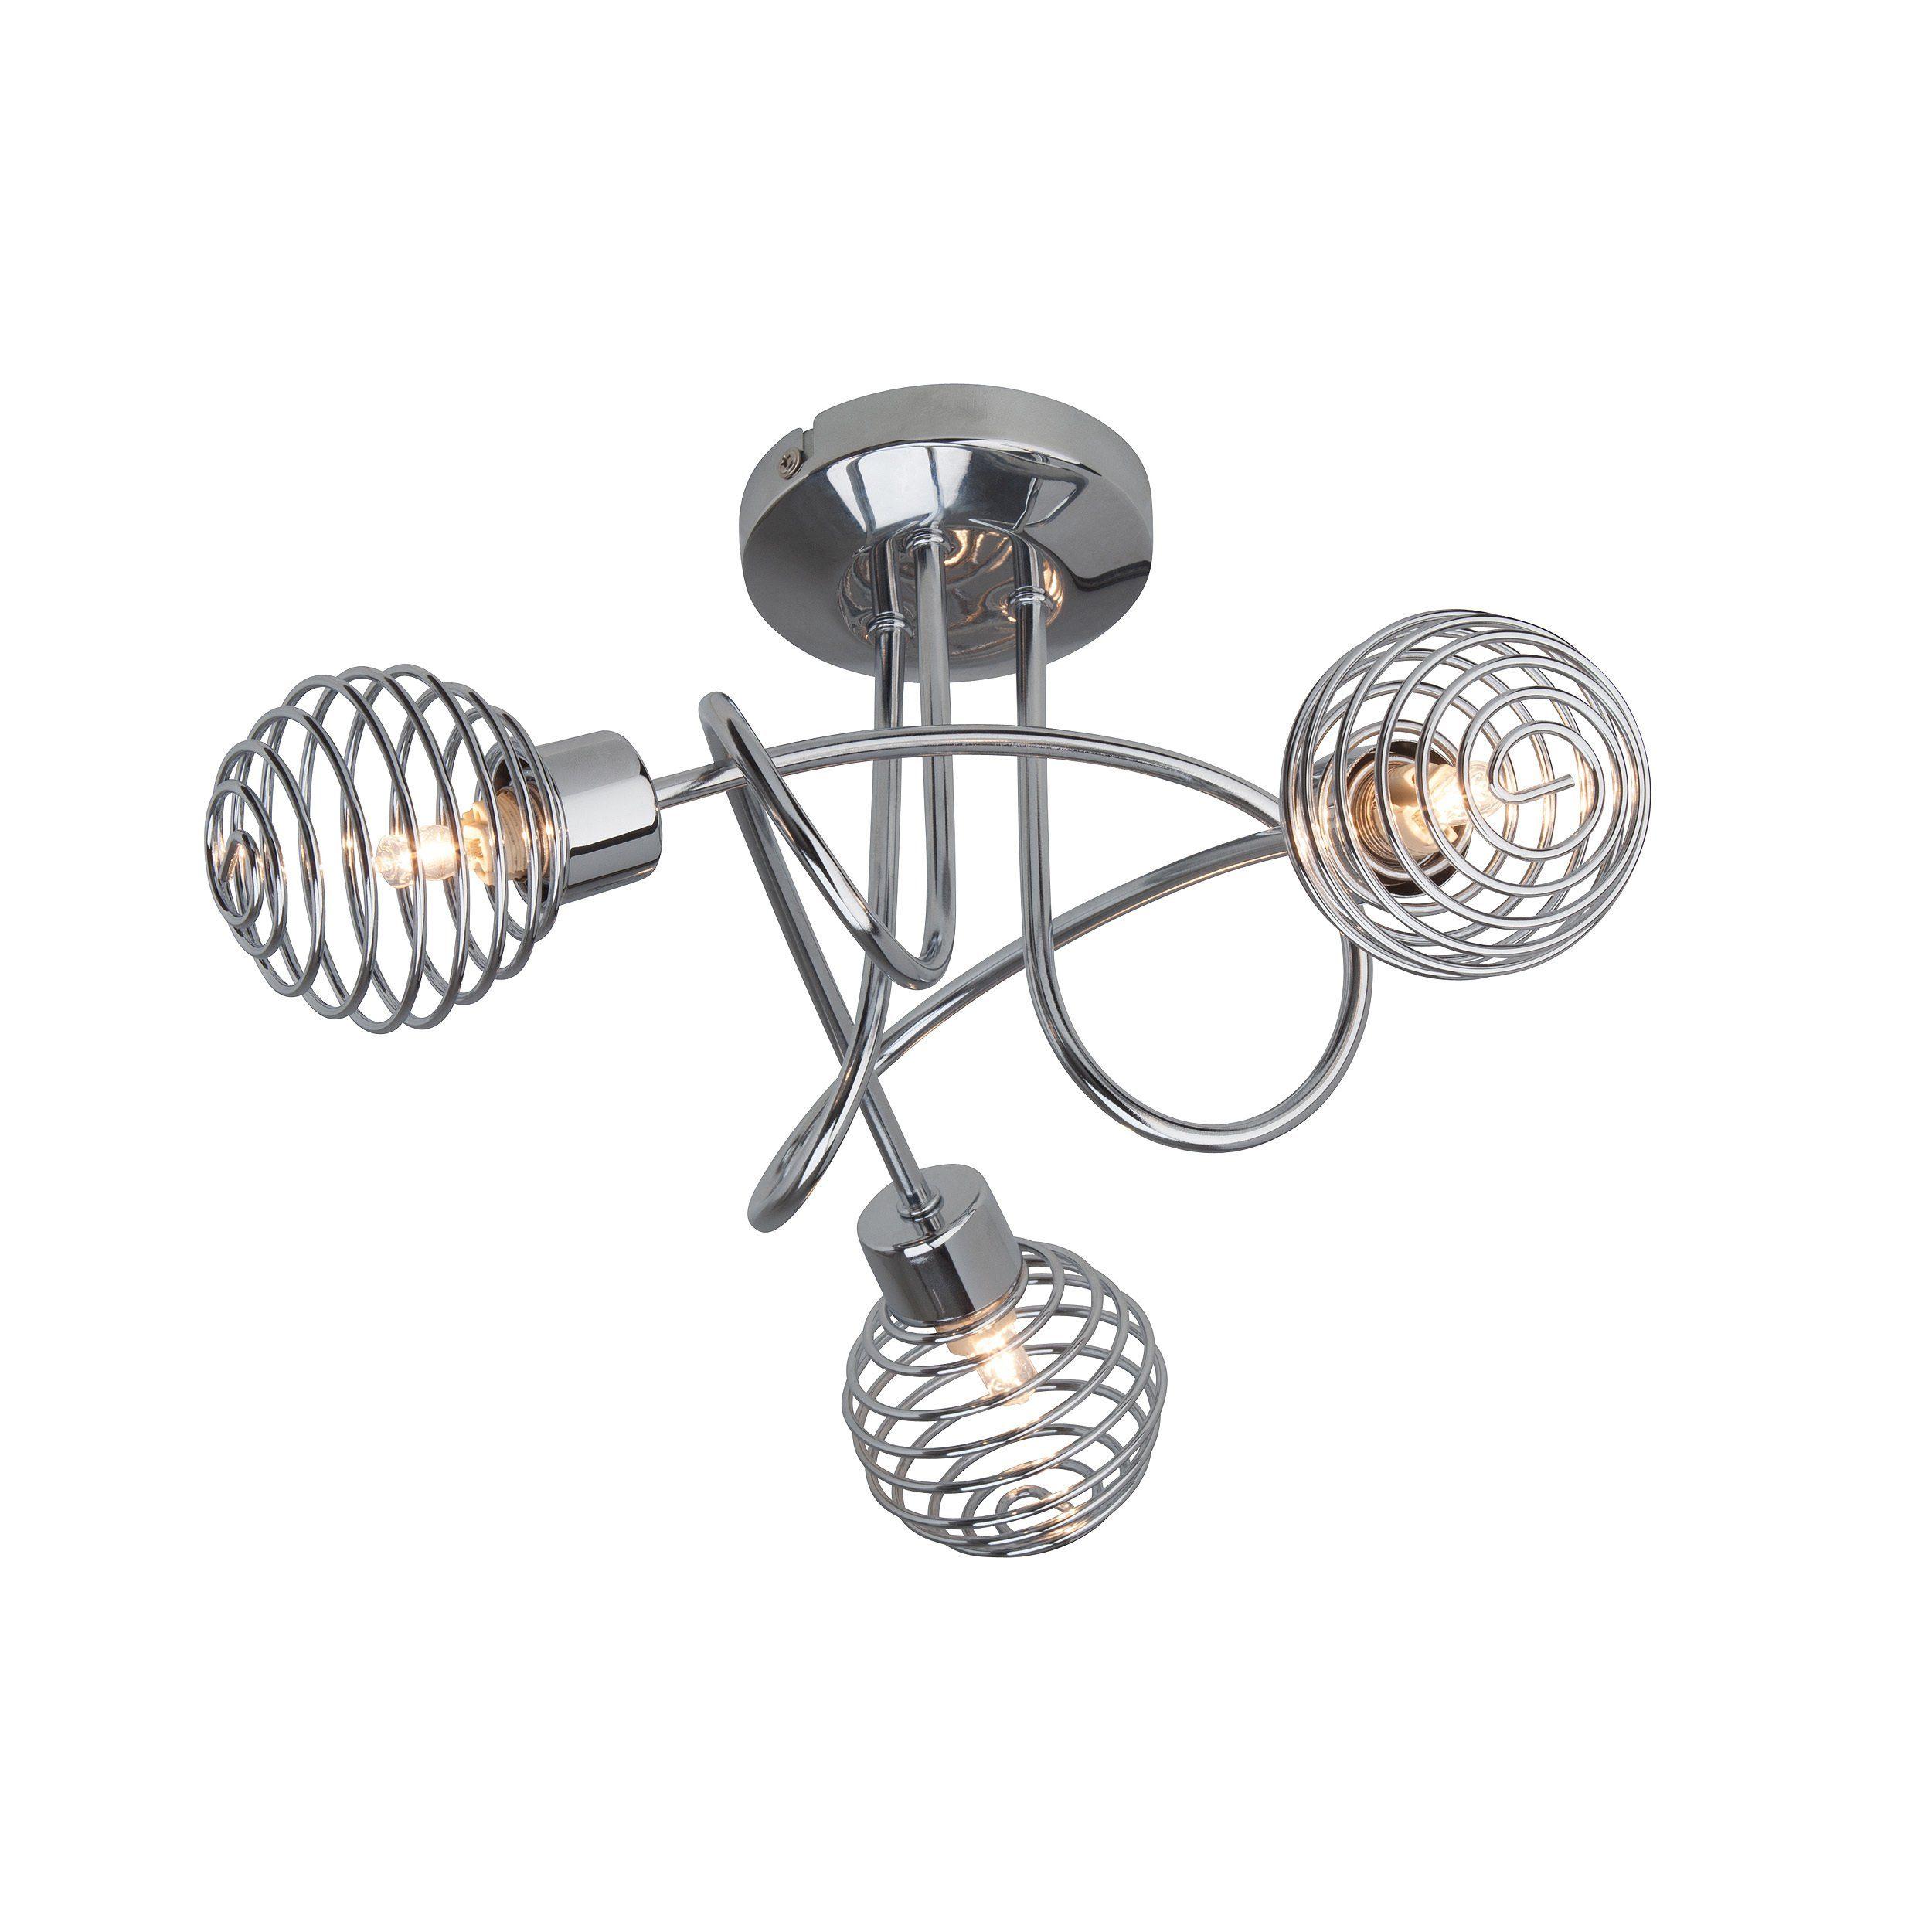 Brilliant Leuchten Charlie Spotrohr, 3-flammig chrom